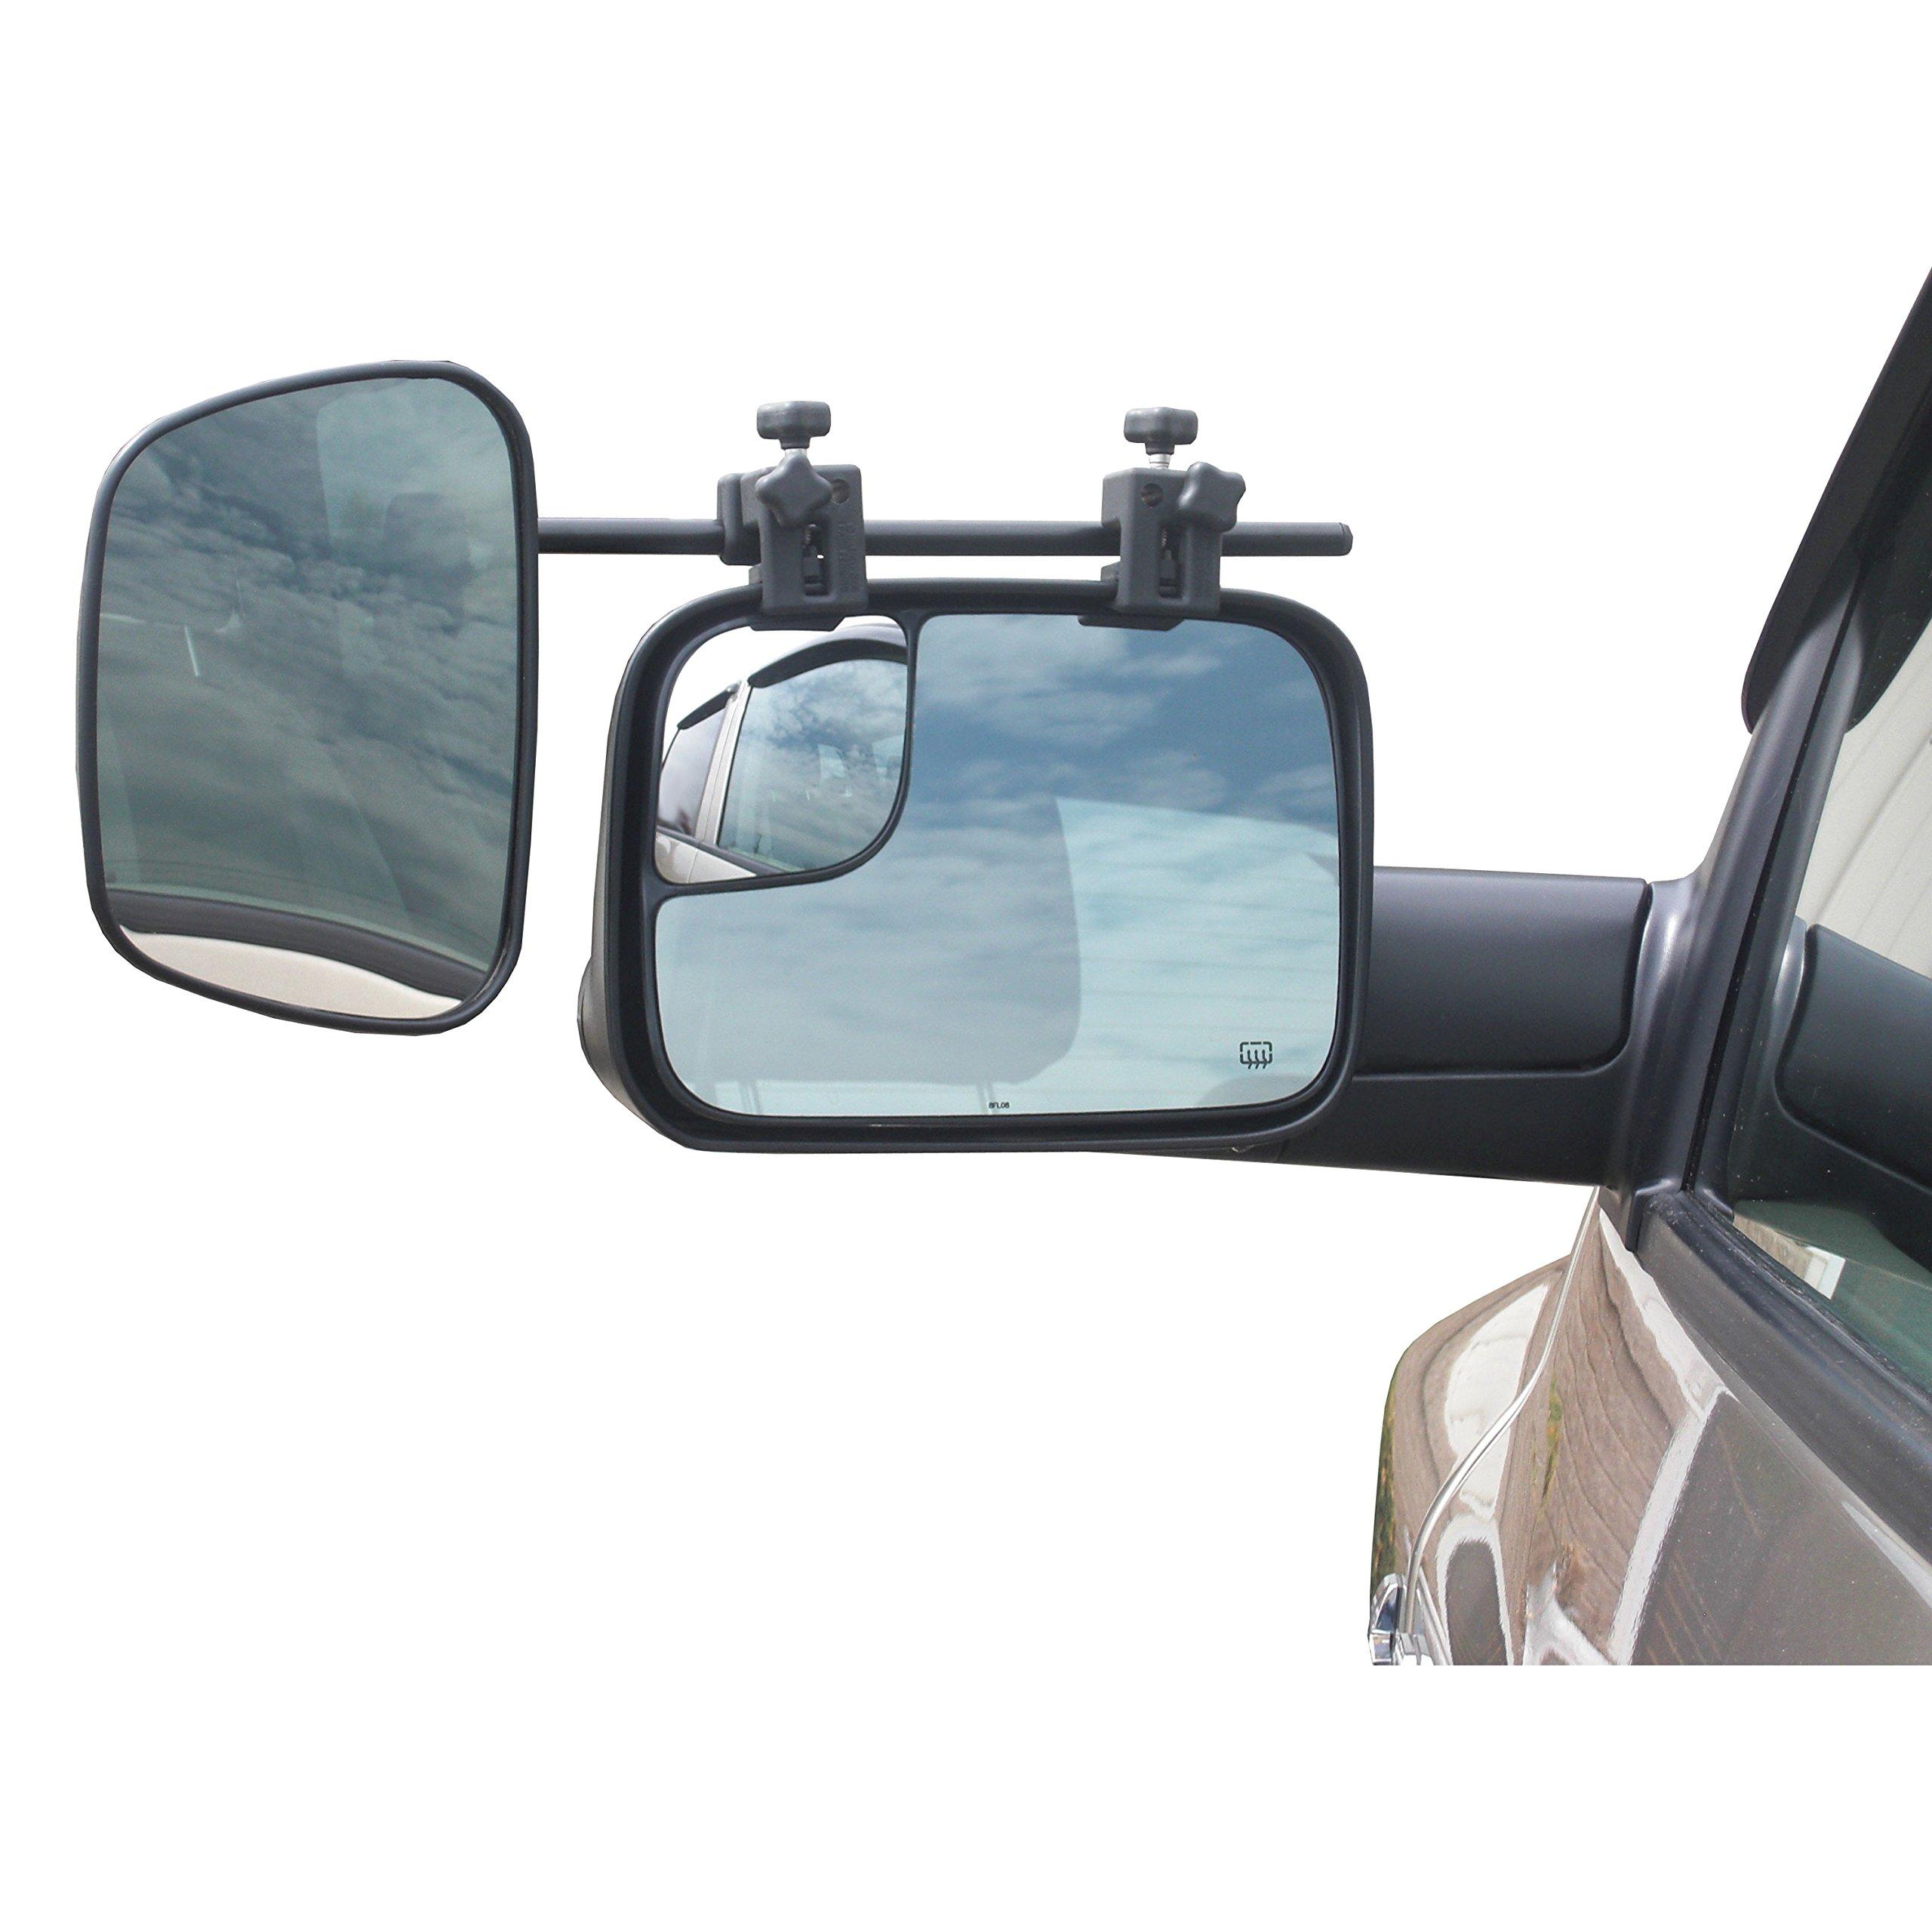 Dometic DM-2912 Milenco Grand Aero3 Towing Mirror - Twin Pack